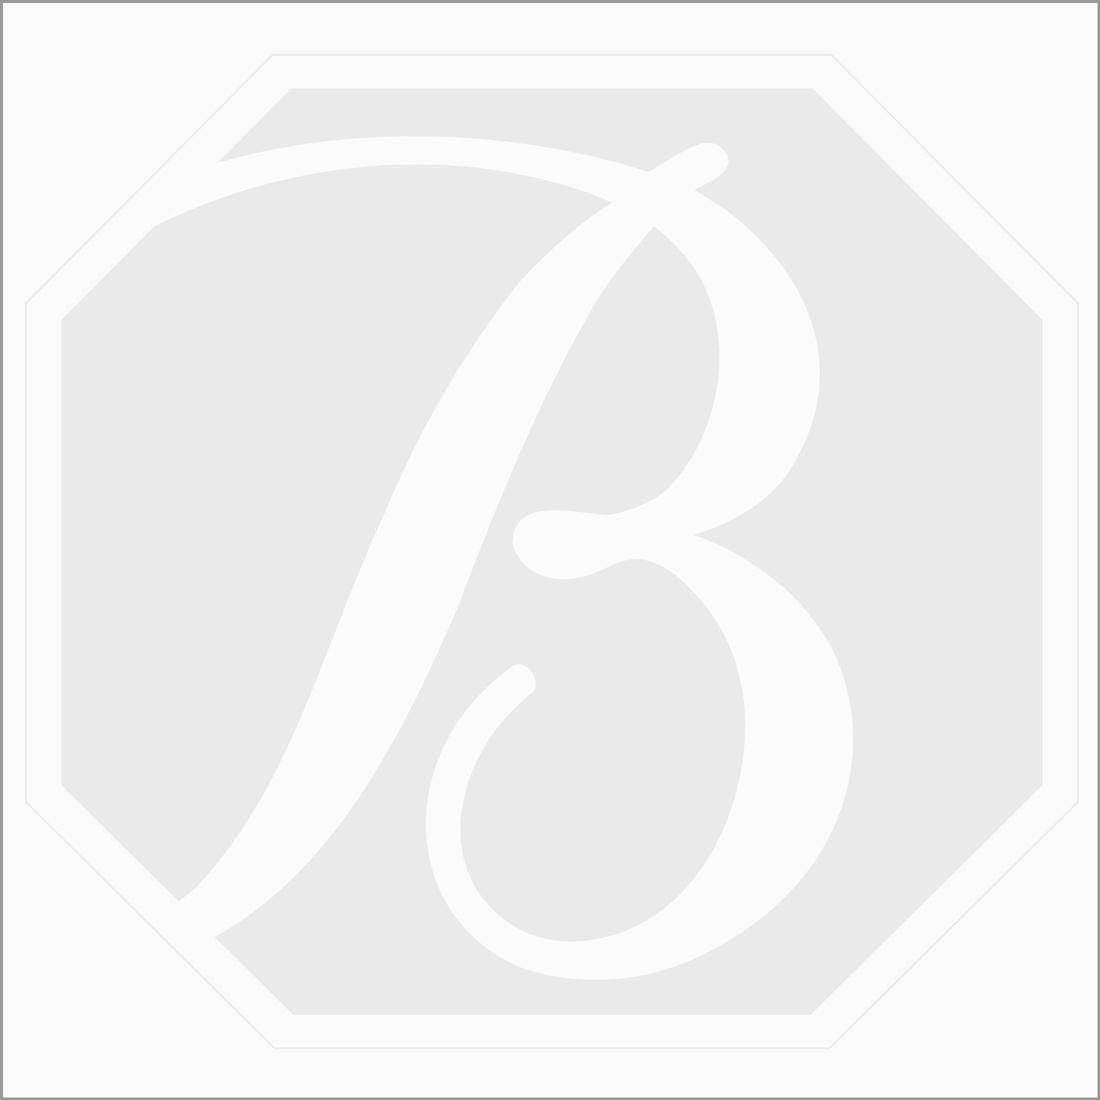 Tiffany, 18kt Rose Gold Lady's Bangle Bracelet - 19.8 grams - EST1201